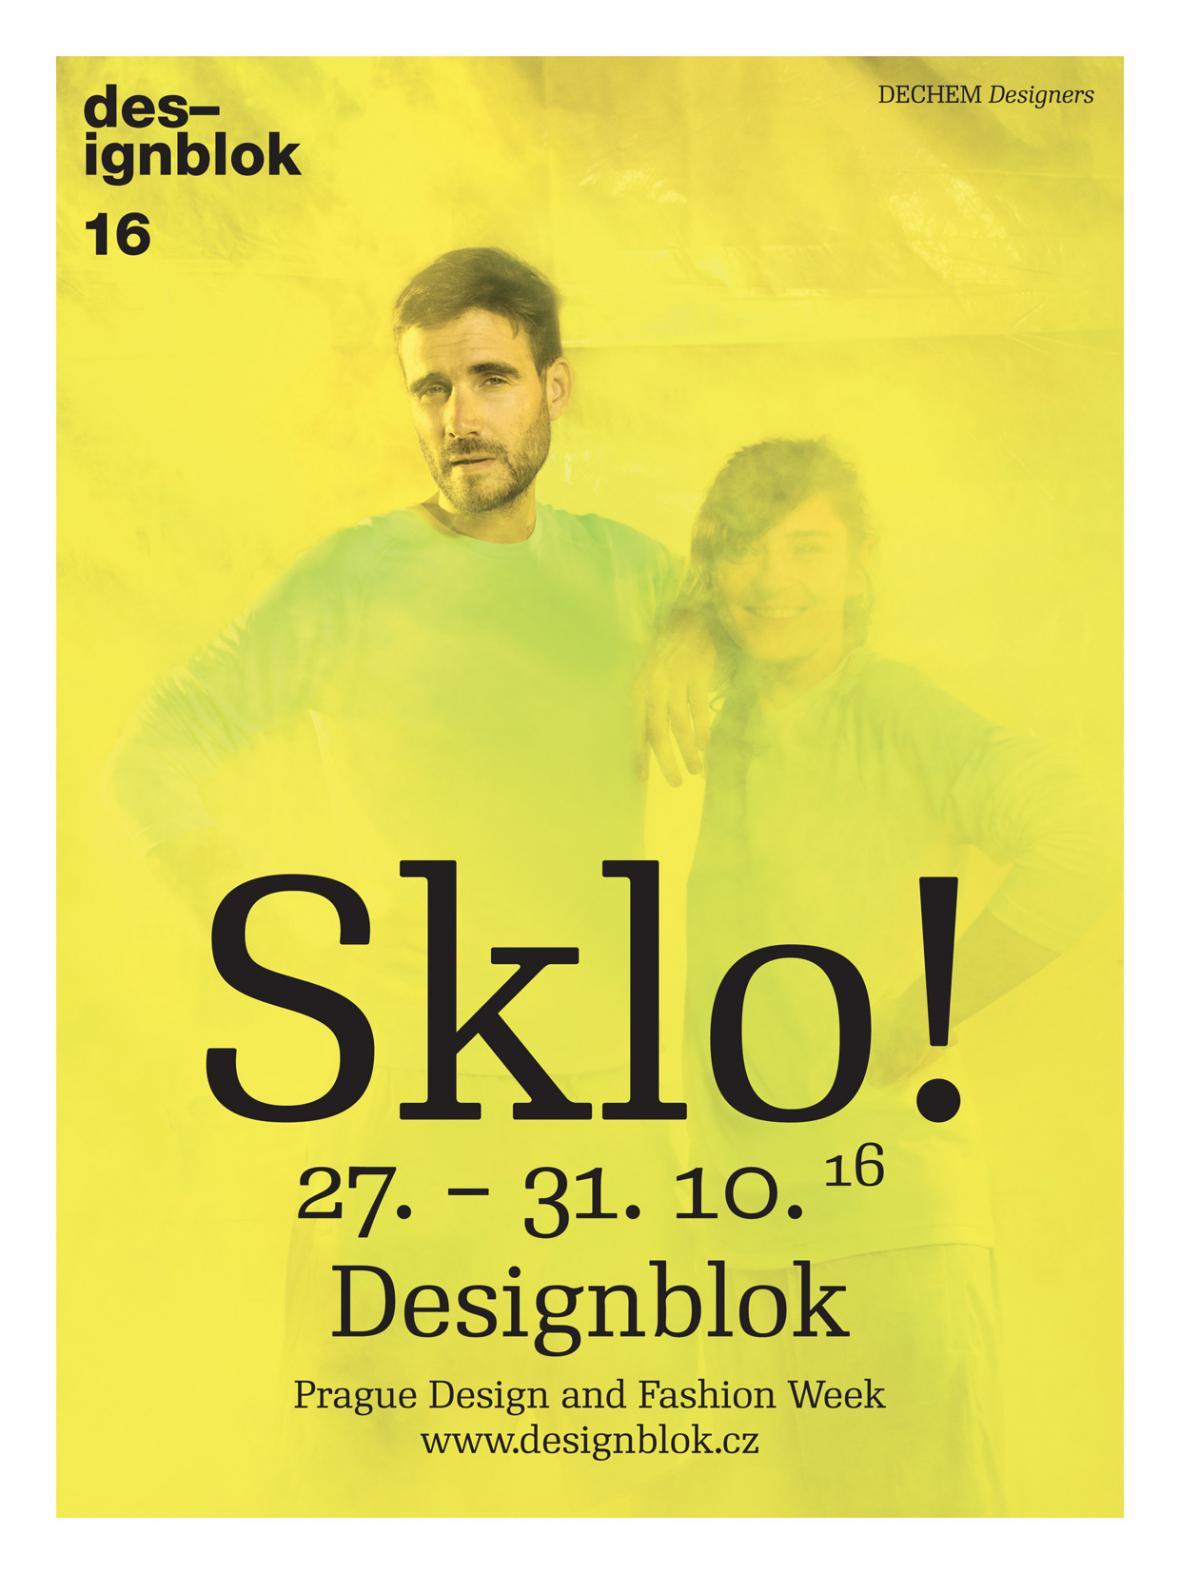 Designblok / DECHEM